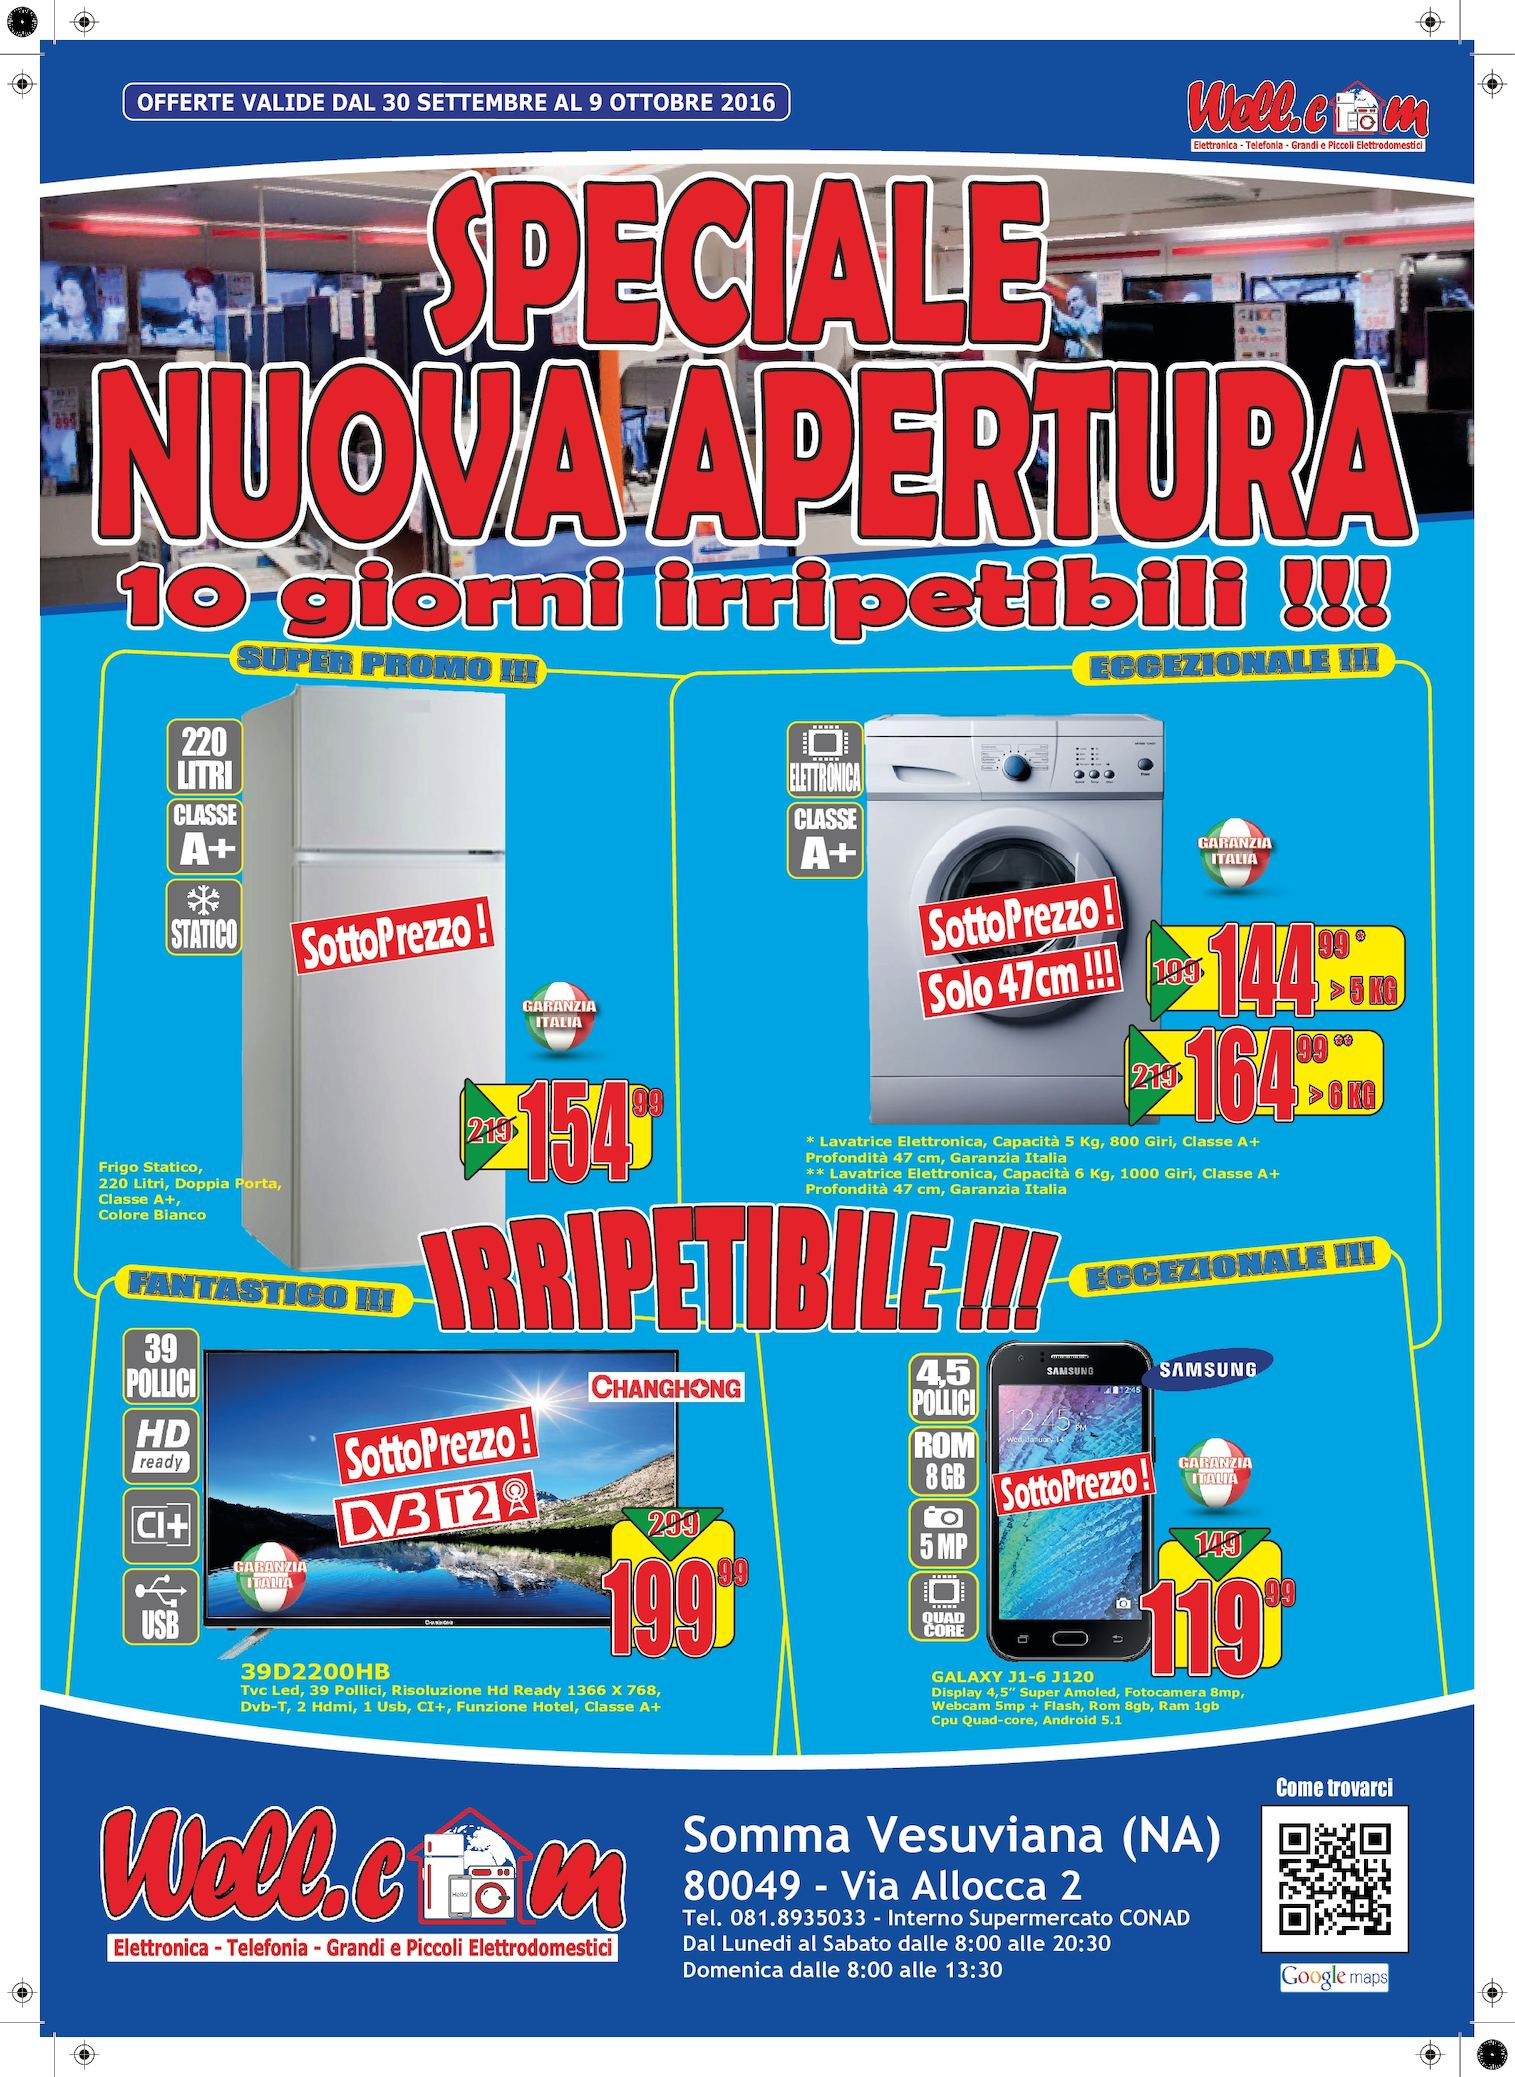 Calam o volantino wellcom nuova apertura somma vesuviana for Bianco arredamenti somma vesuviana